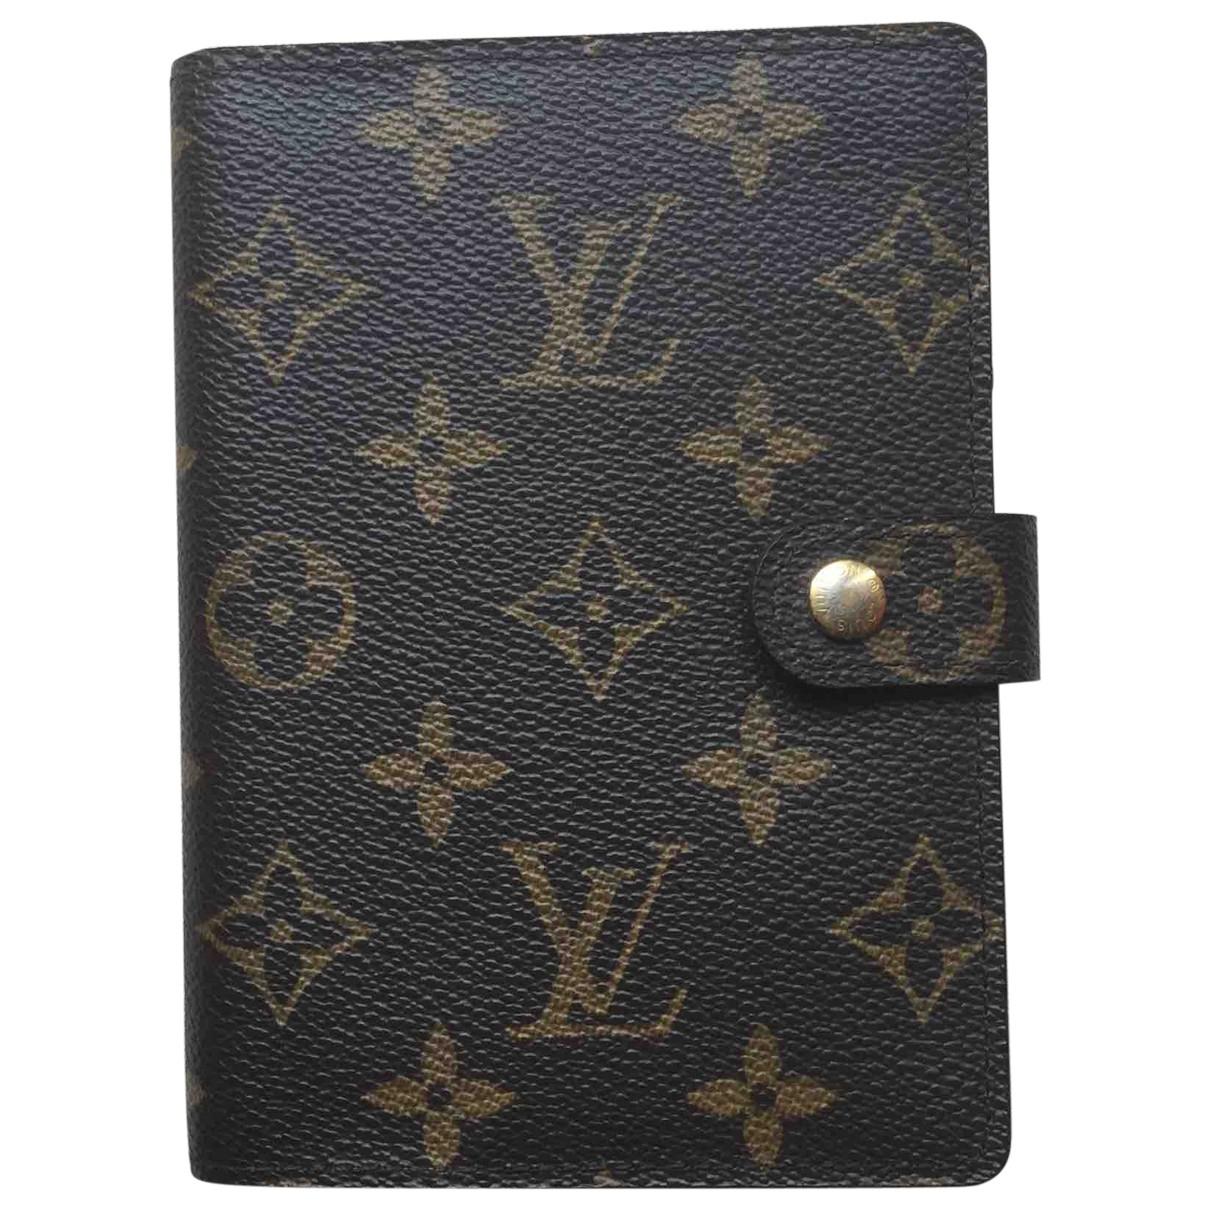 Louis Vuitton Couverture agenda de bureau Accessoires und Dekoration in  Braun Leinen